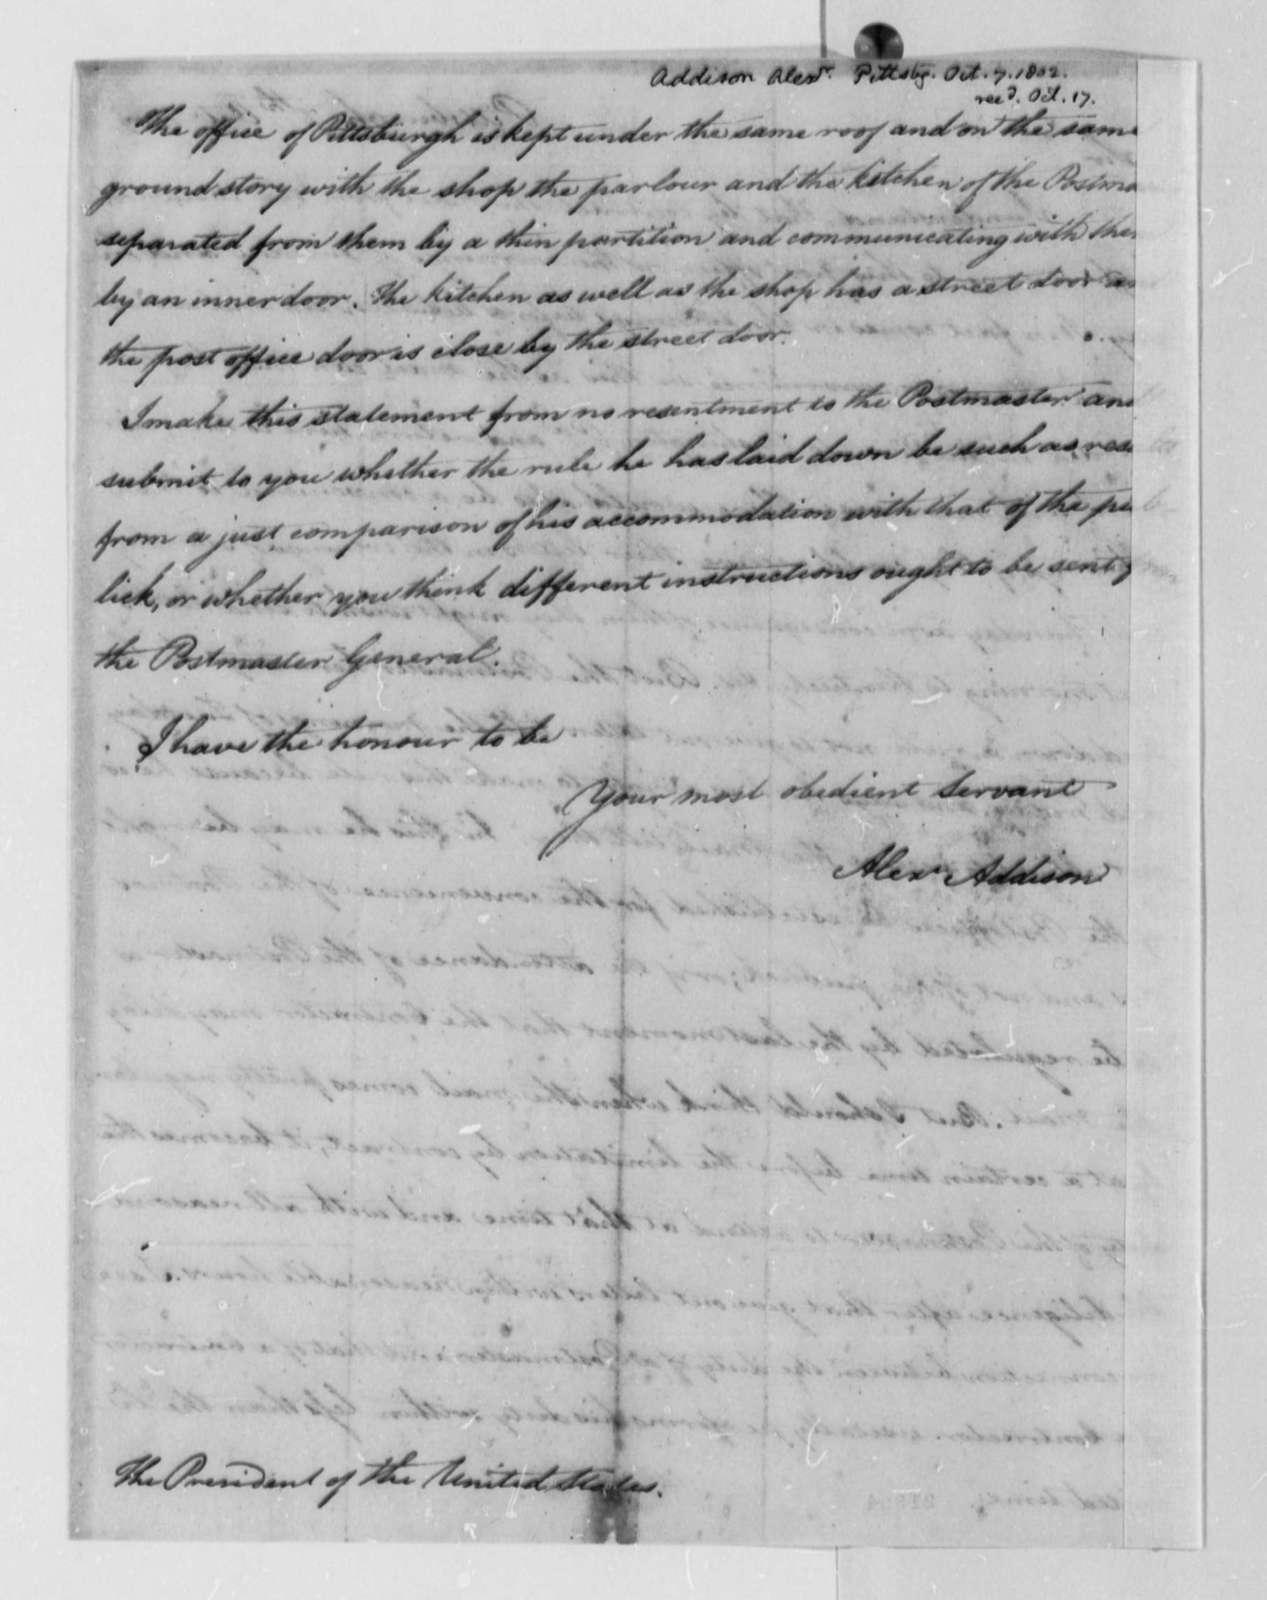 Alexander Addison to Thomas Jefferson, October 7, 1802